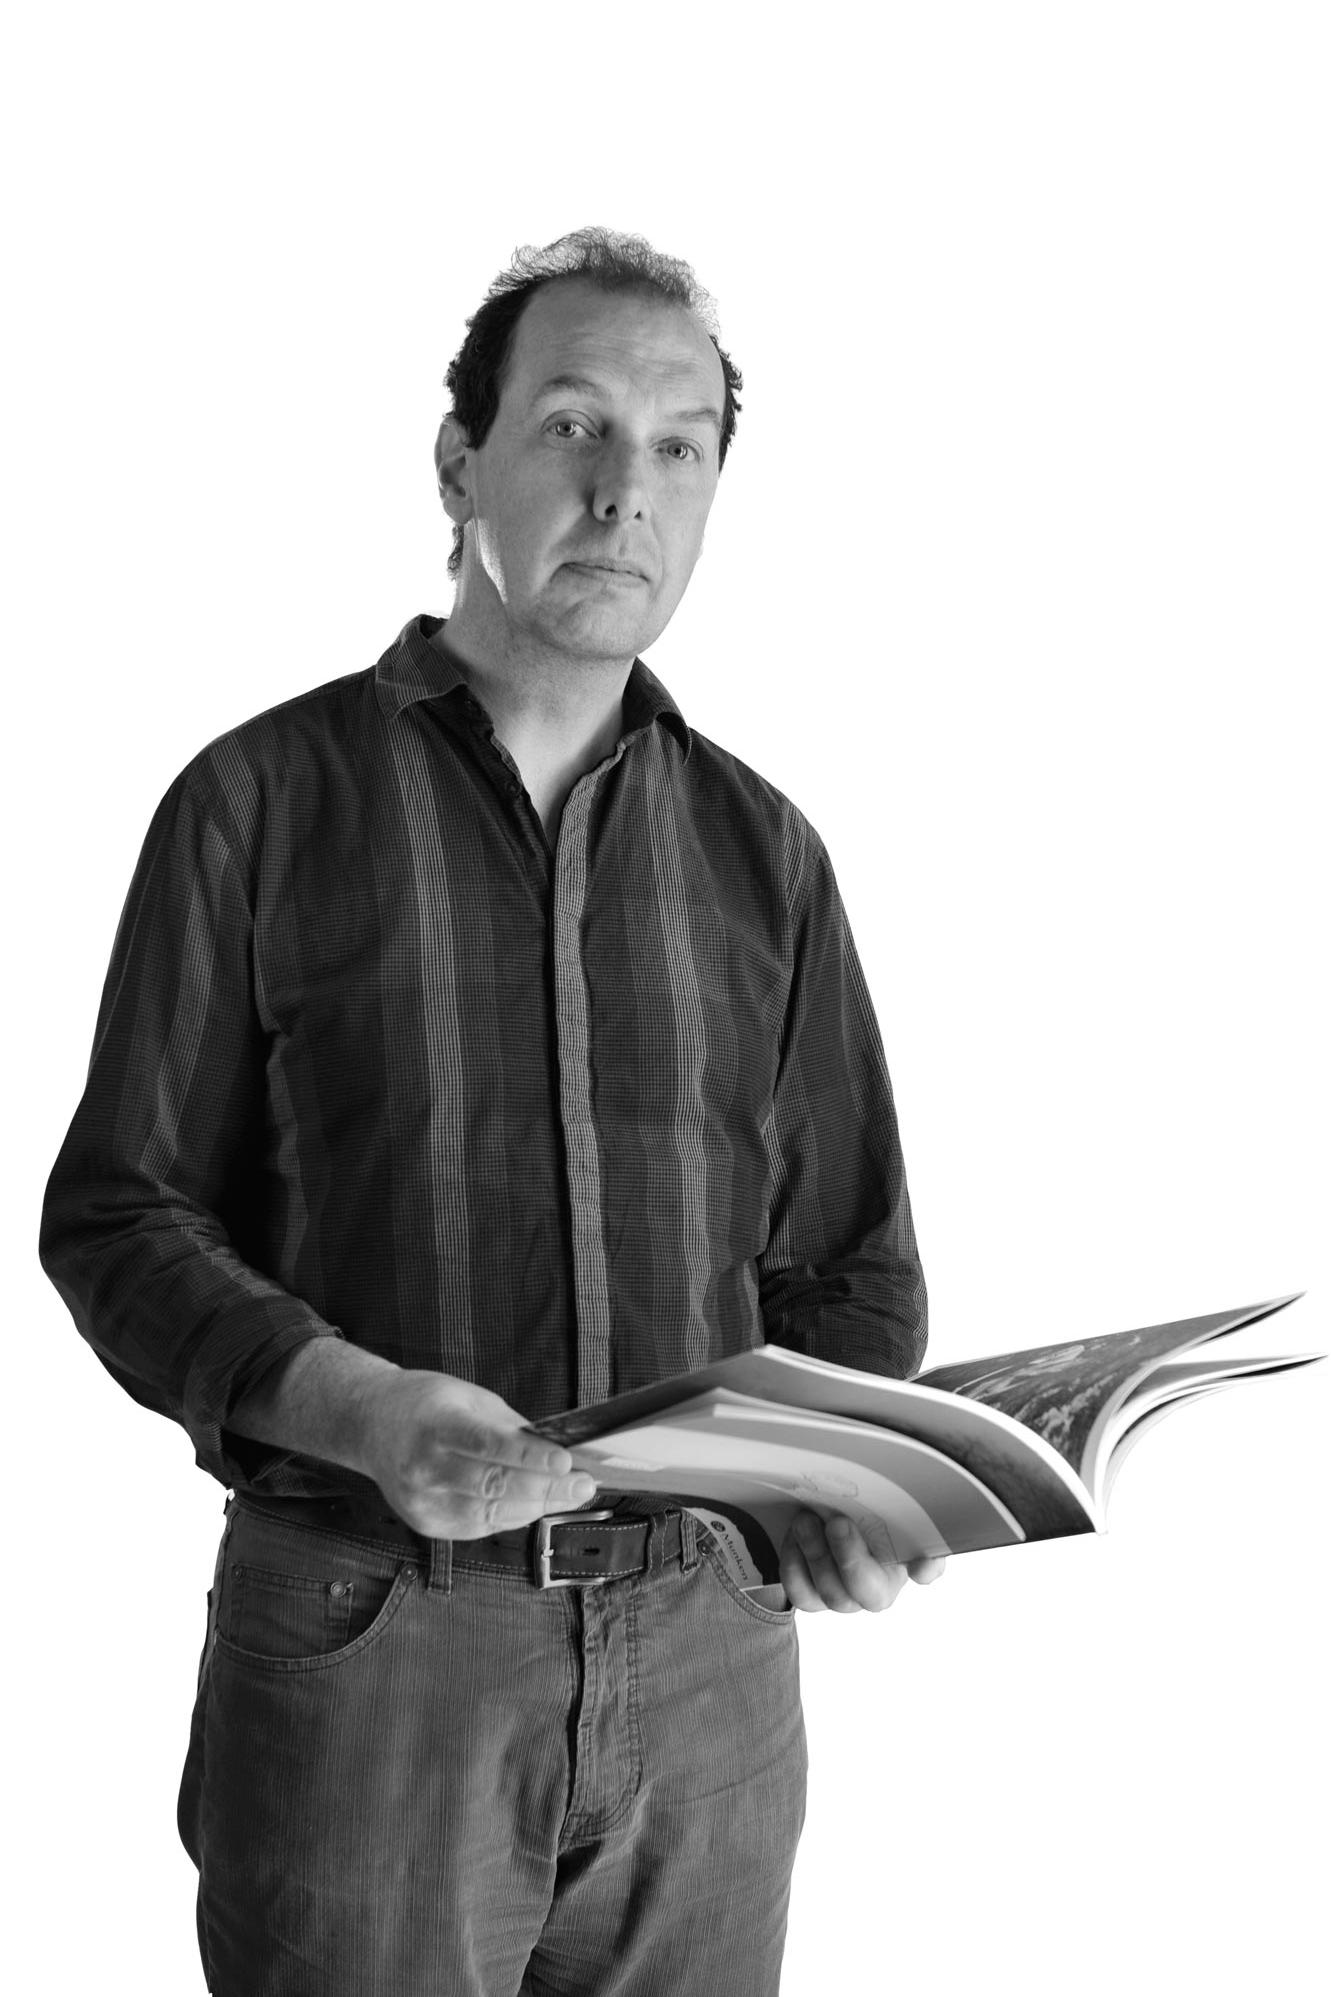 François-Xavier Delogne    Vastgoed- en bouwrecht Familie-, vermogens-, notarieel recht     T  +32 (0)2 501 61 12  F :  +32 (0)2 514 22 31   E :   fx.delogne@wery.legal